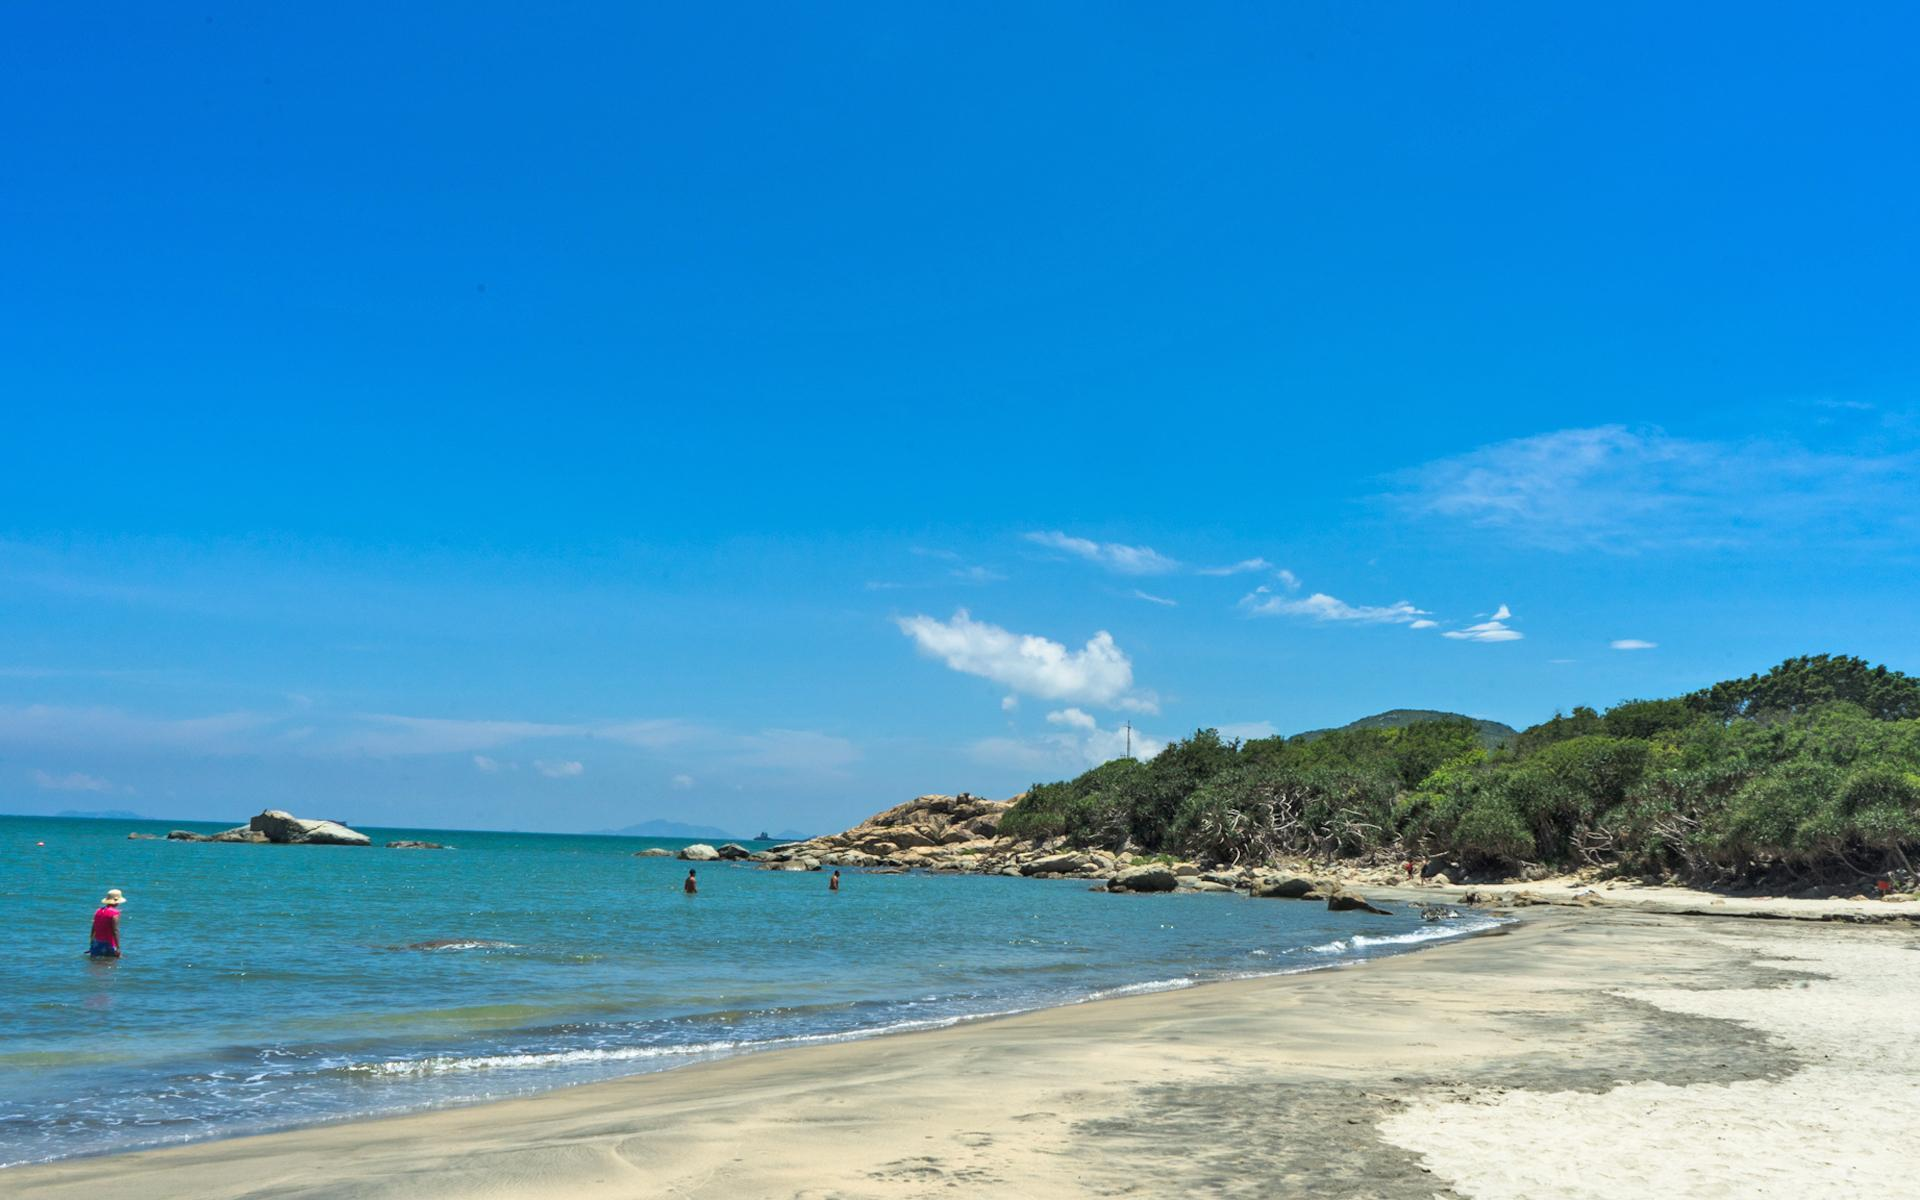 The Cove Hostel - Tong Fuk Octopus, Lantau Islands